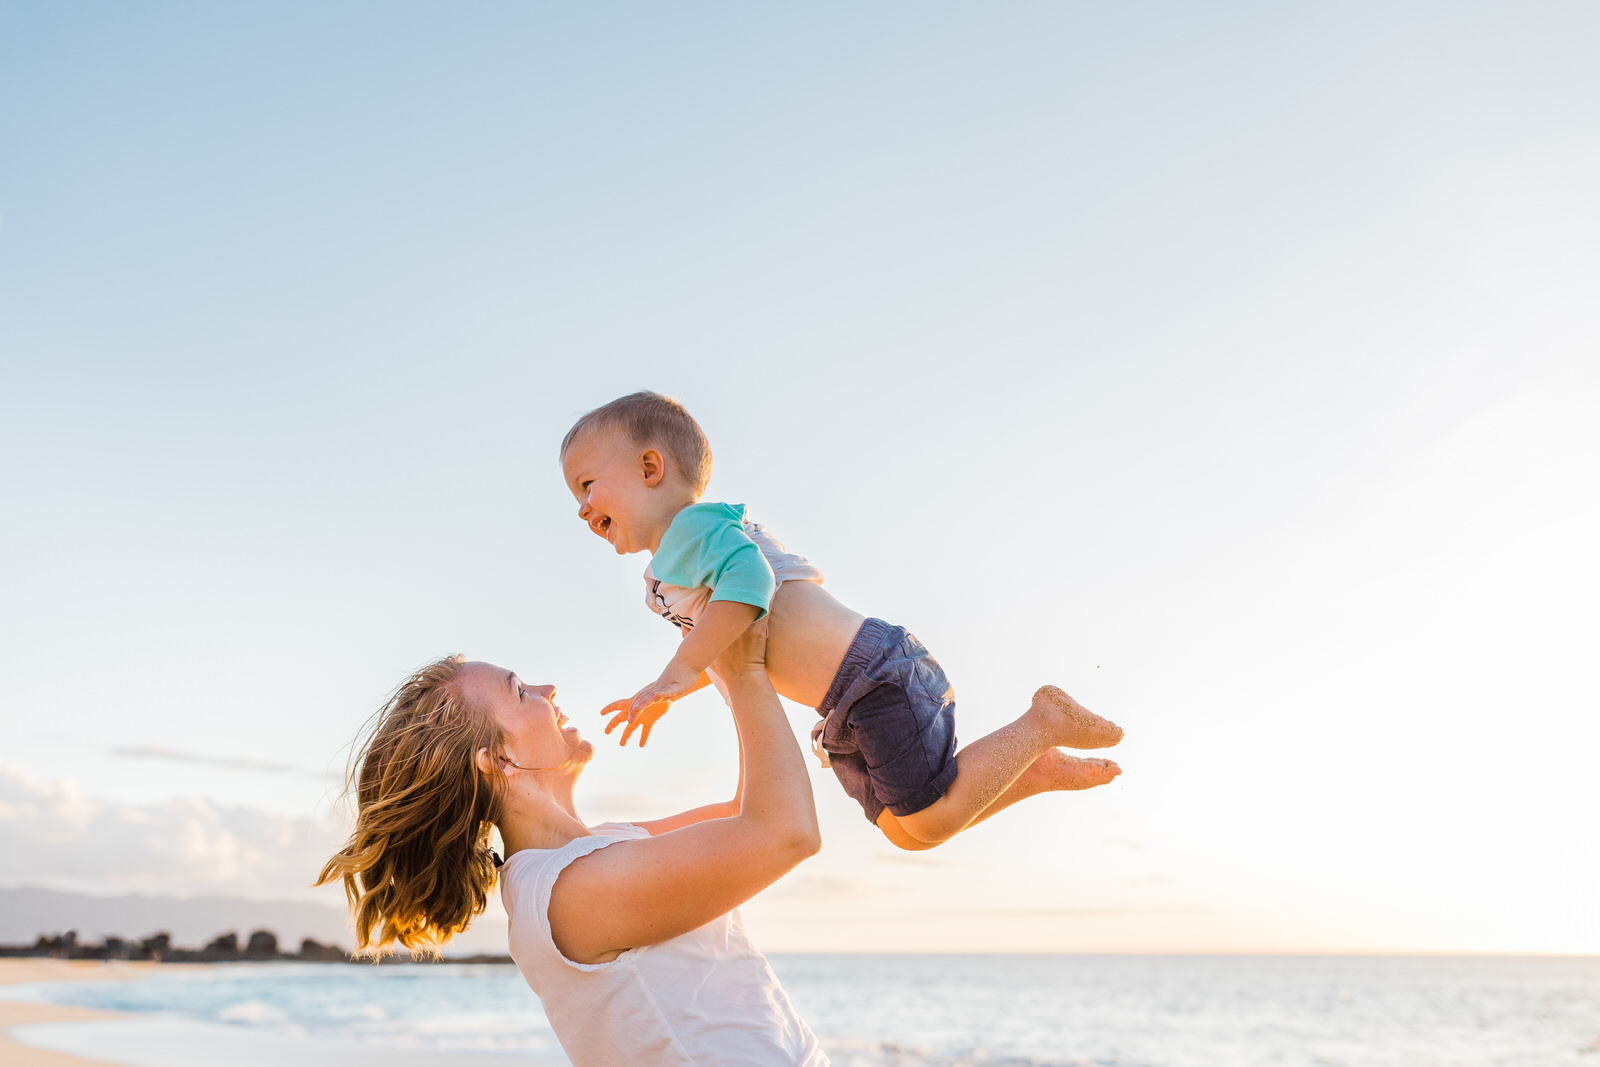 extended-family-big-island-vacation-cousins-grandparents-beach-waikoloa-sunset-hawaii-7154.jpg